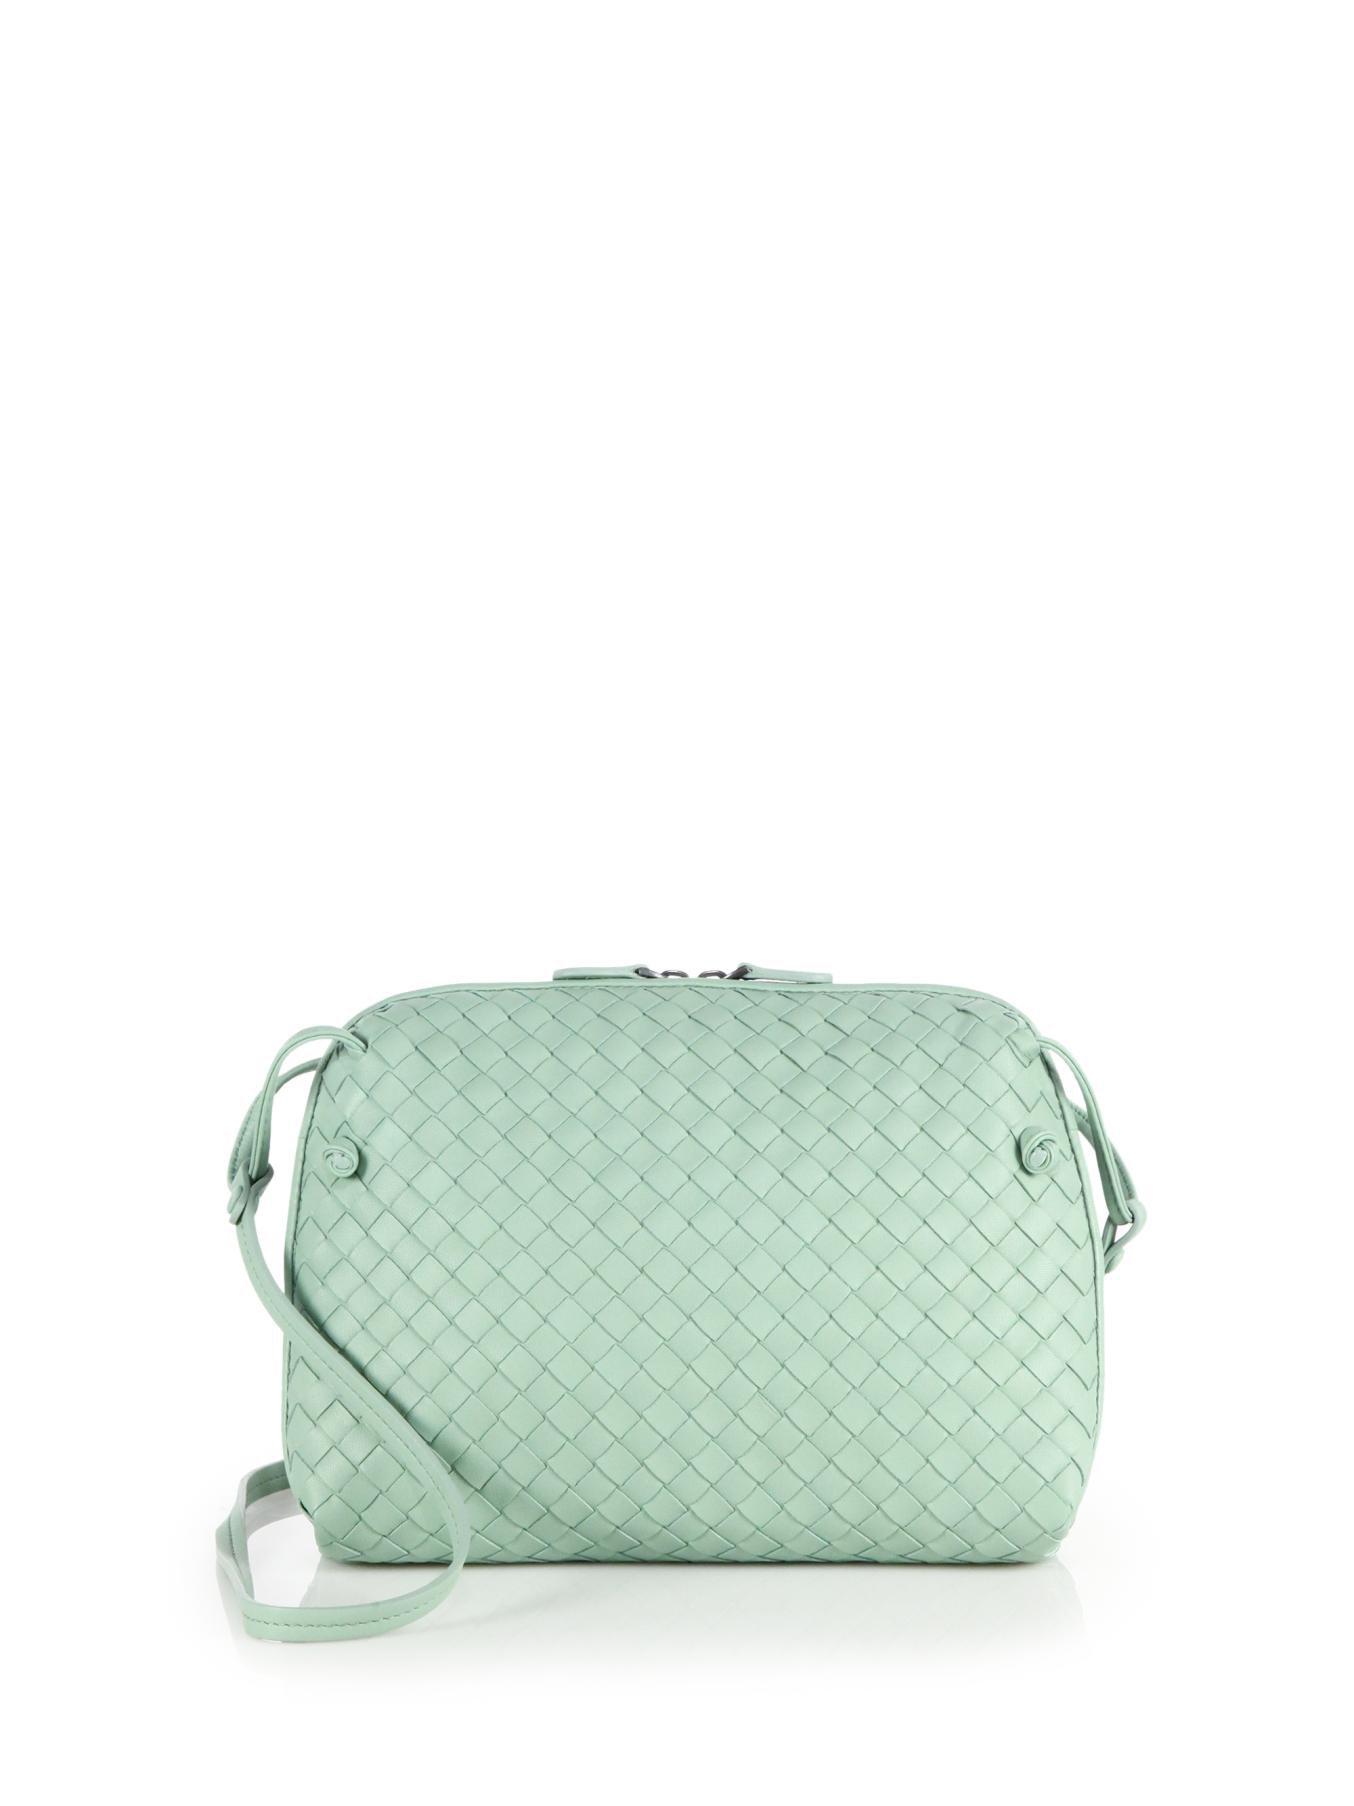 70cff00e2c5c Lyst - Bottega Veneta Small Pillow Intrecciato Leather Crossbody Bag ...